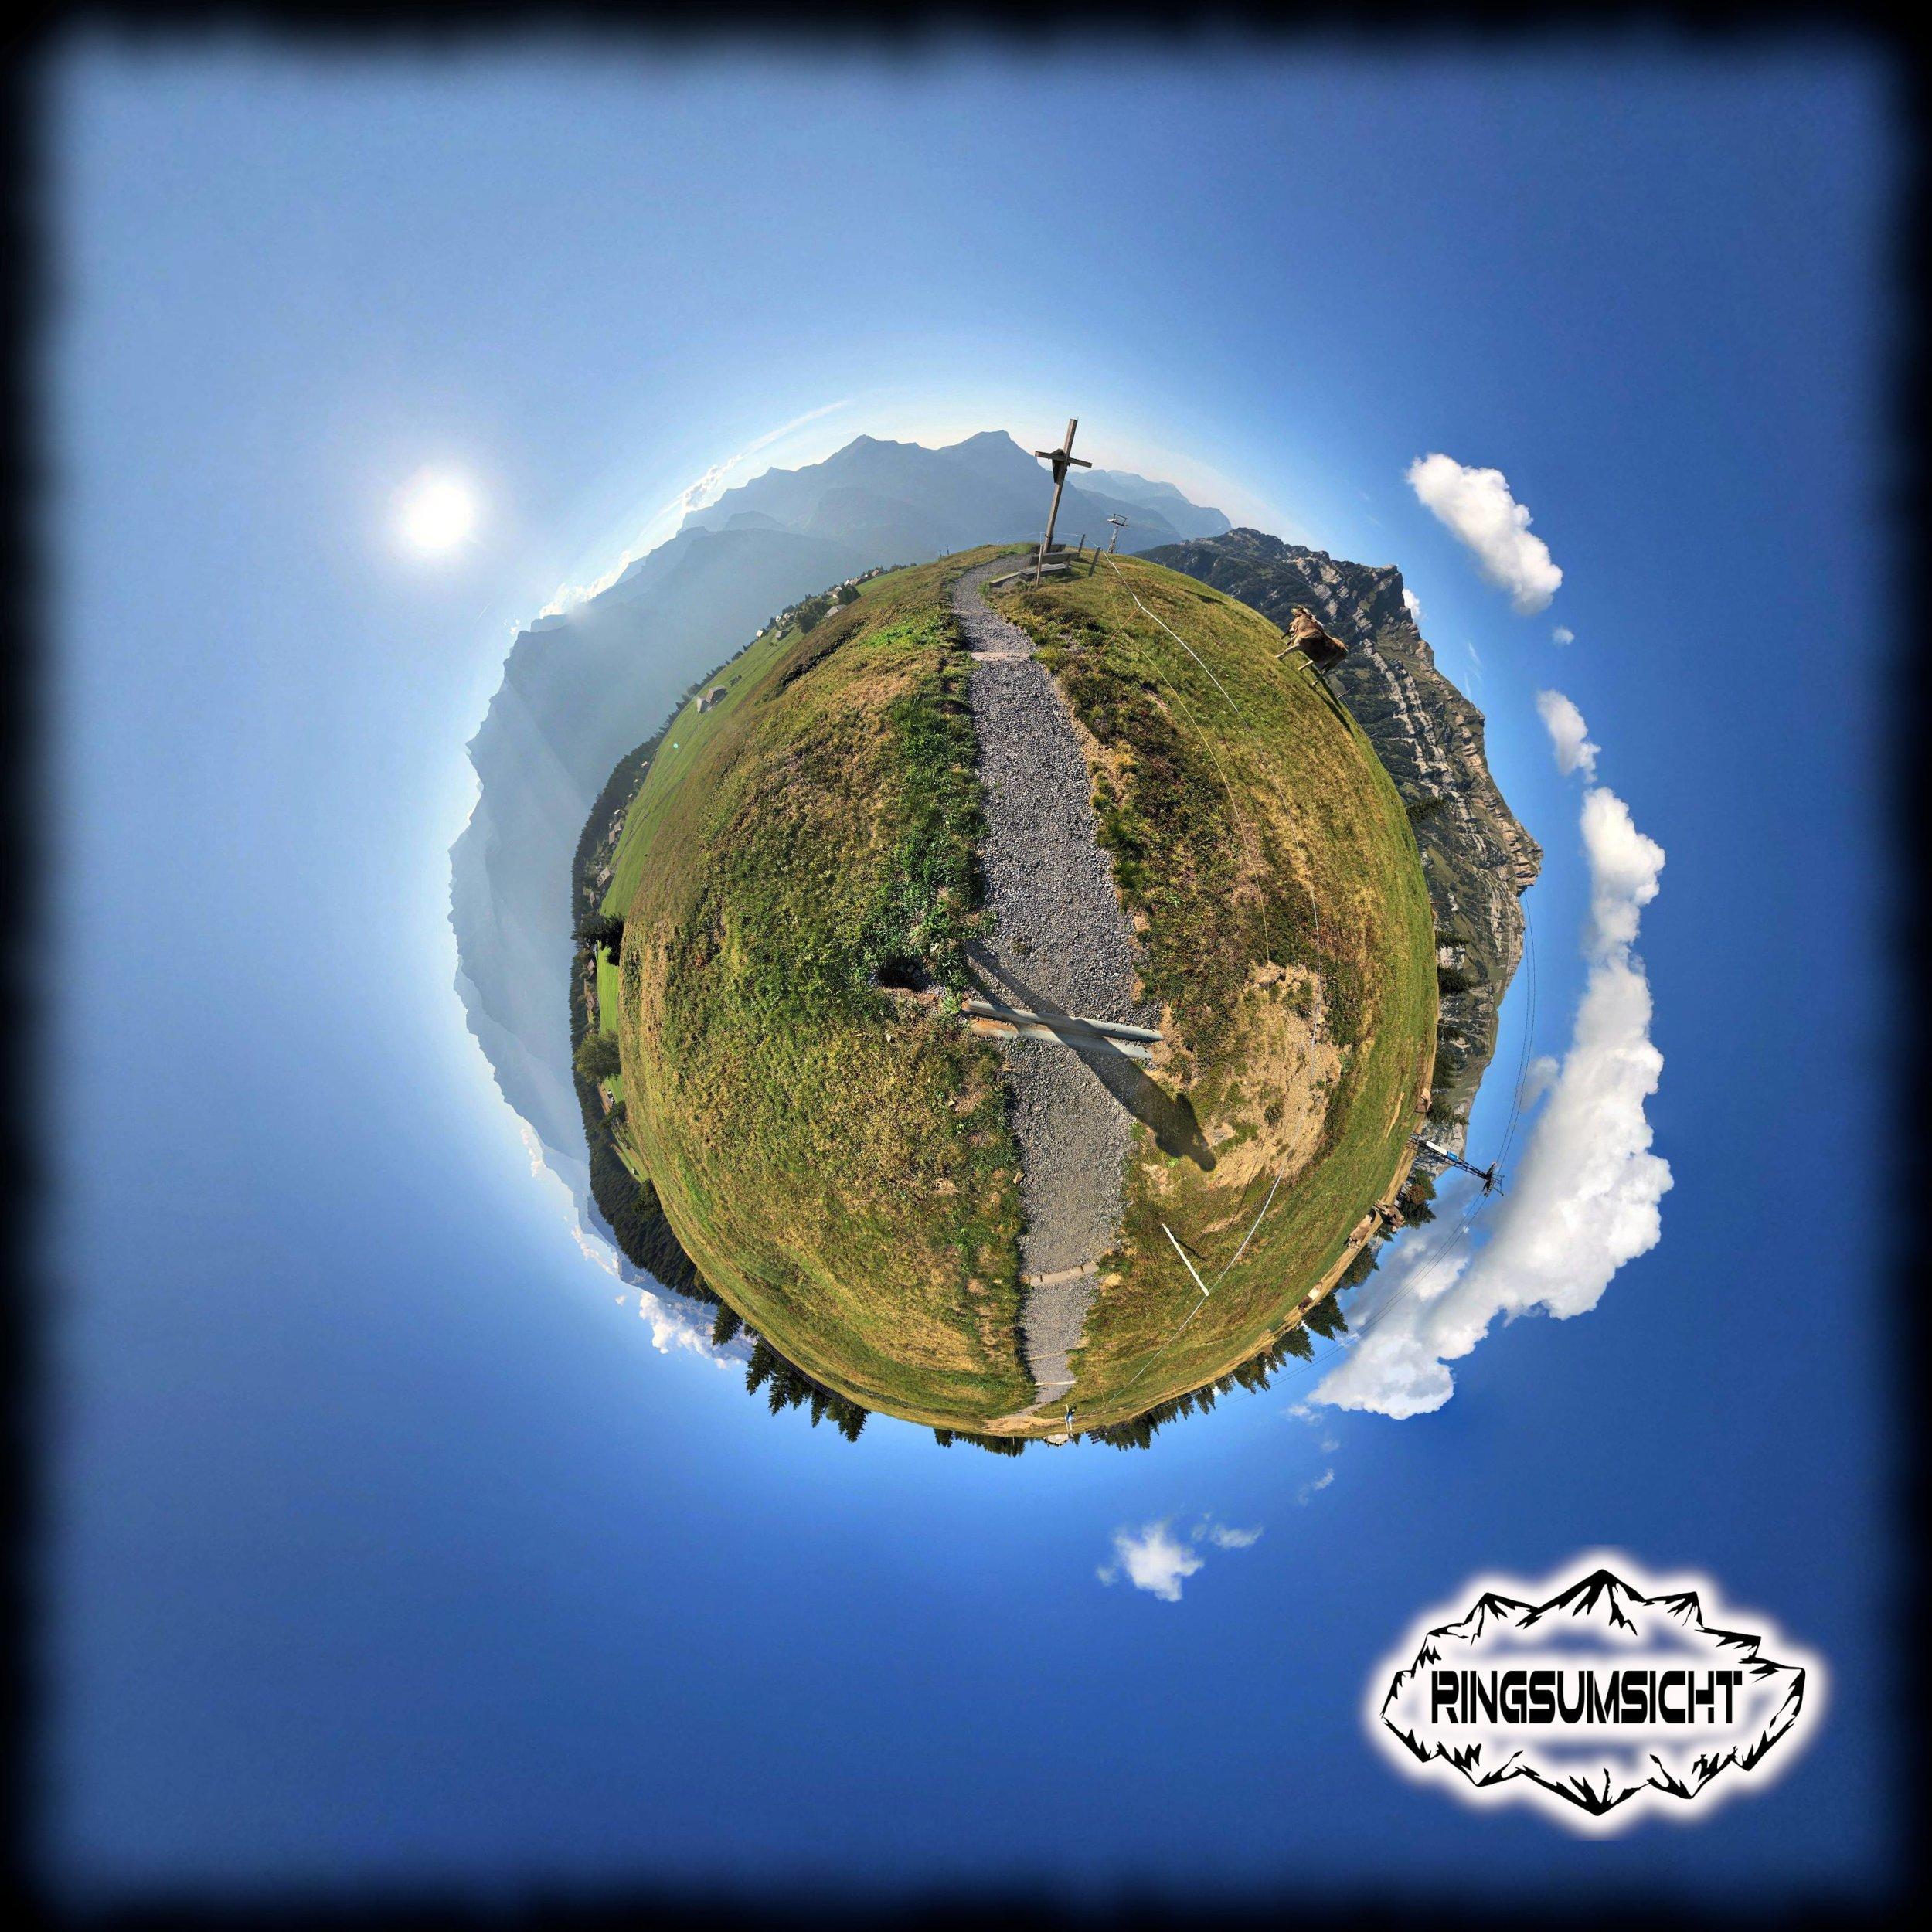 Eggberge tiny planet 360° bild